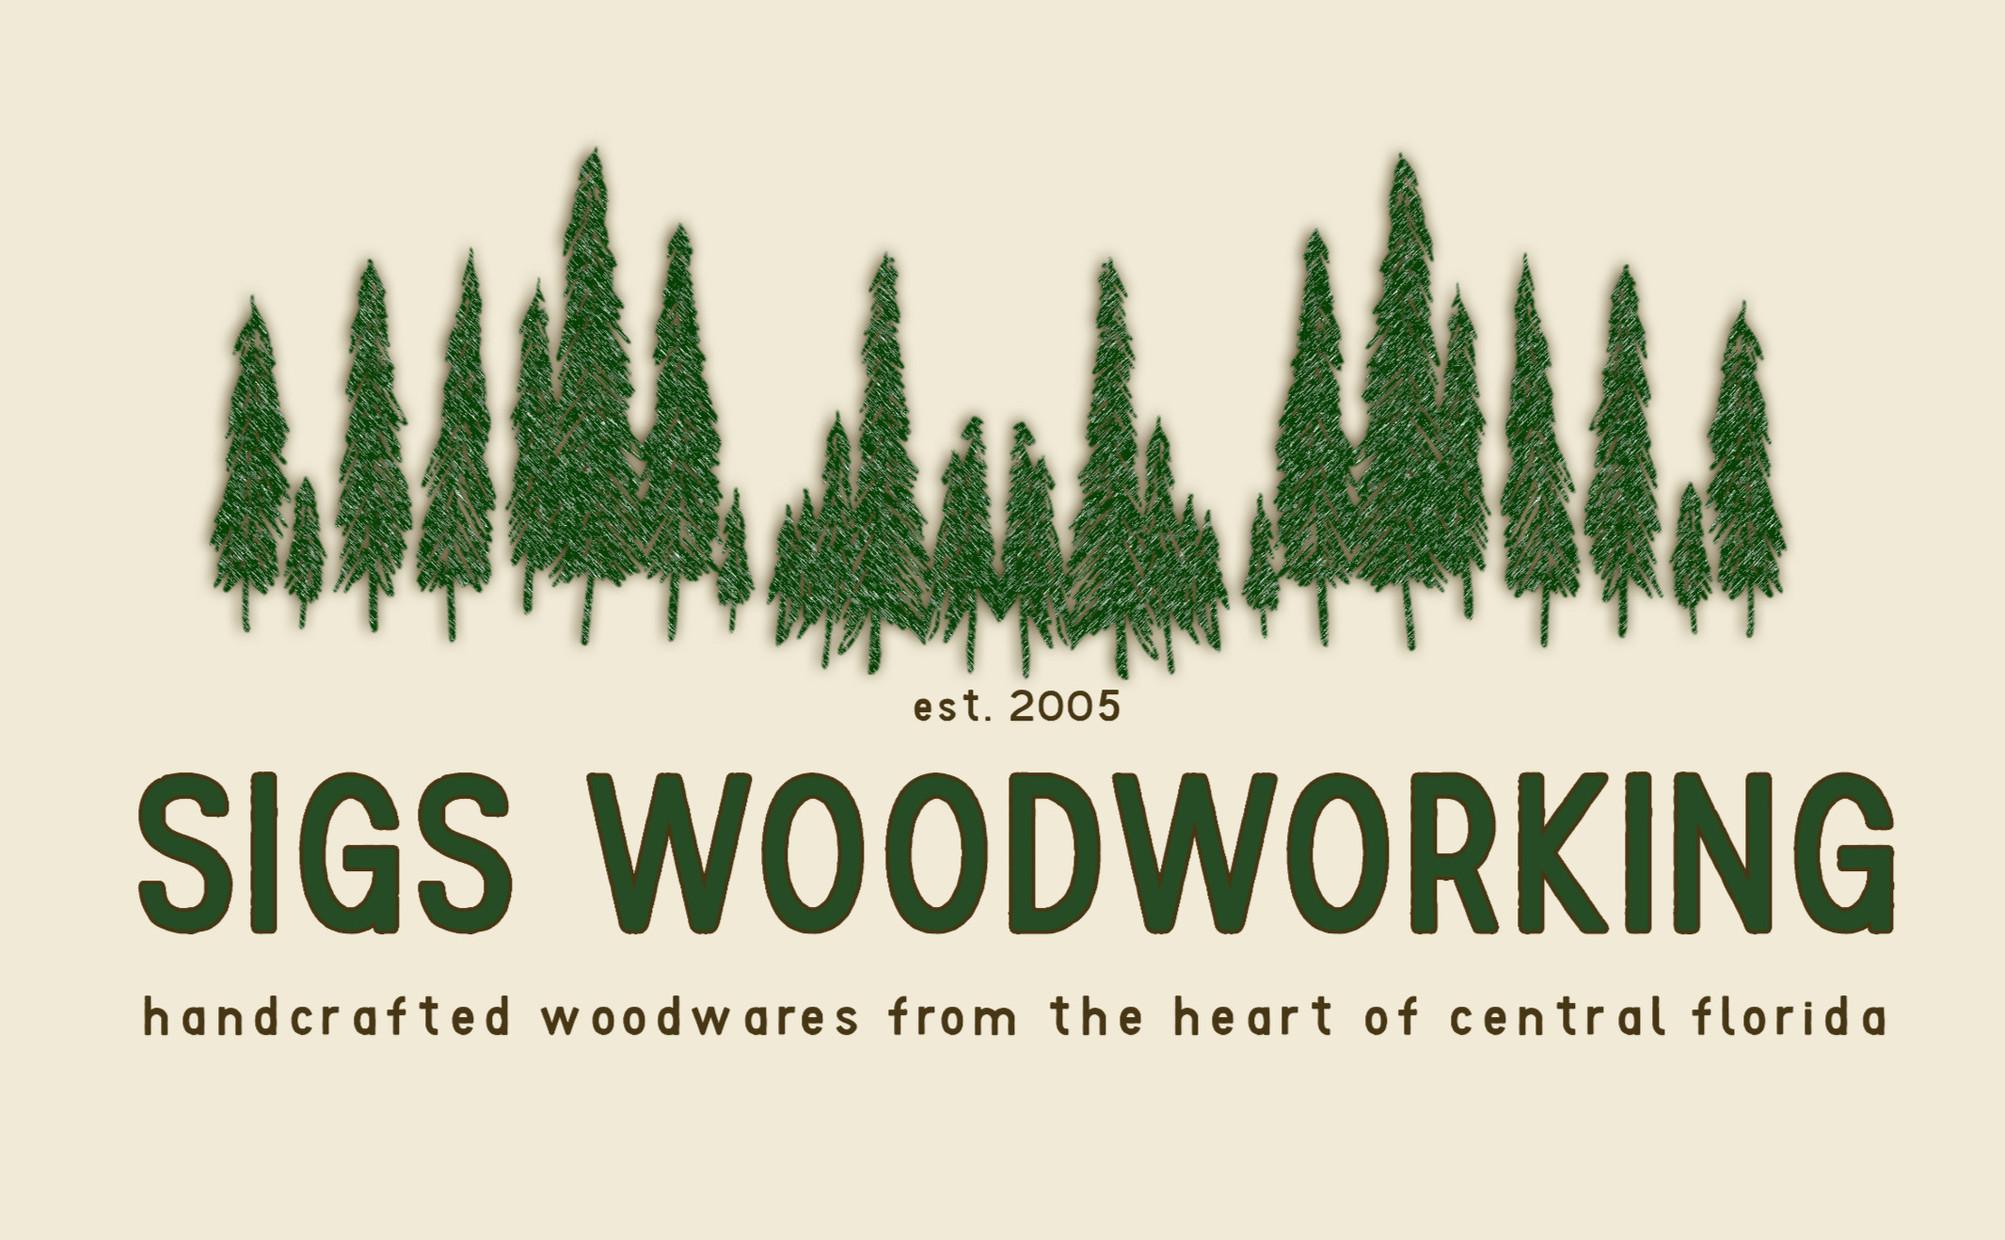 Sigs Woodworking - New Business Branding